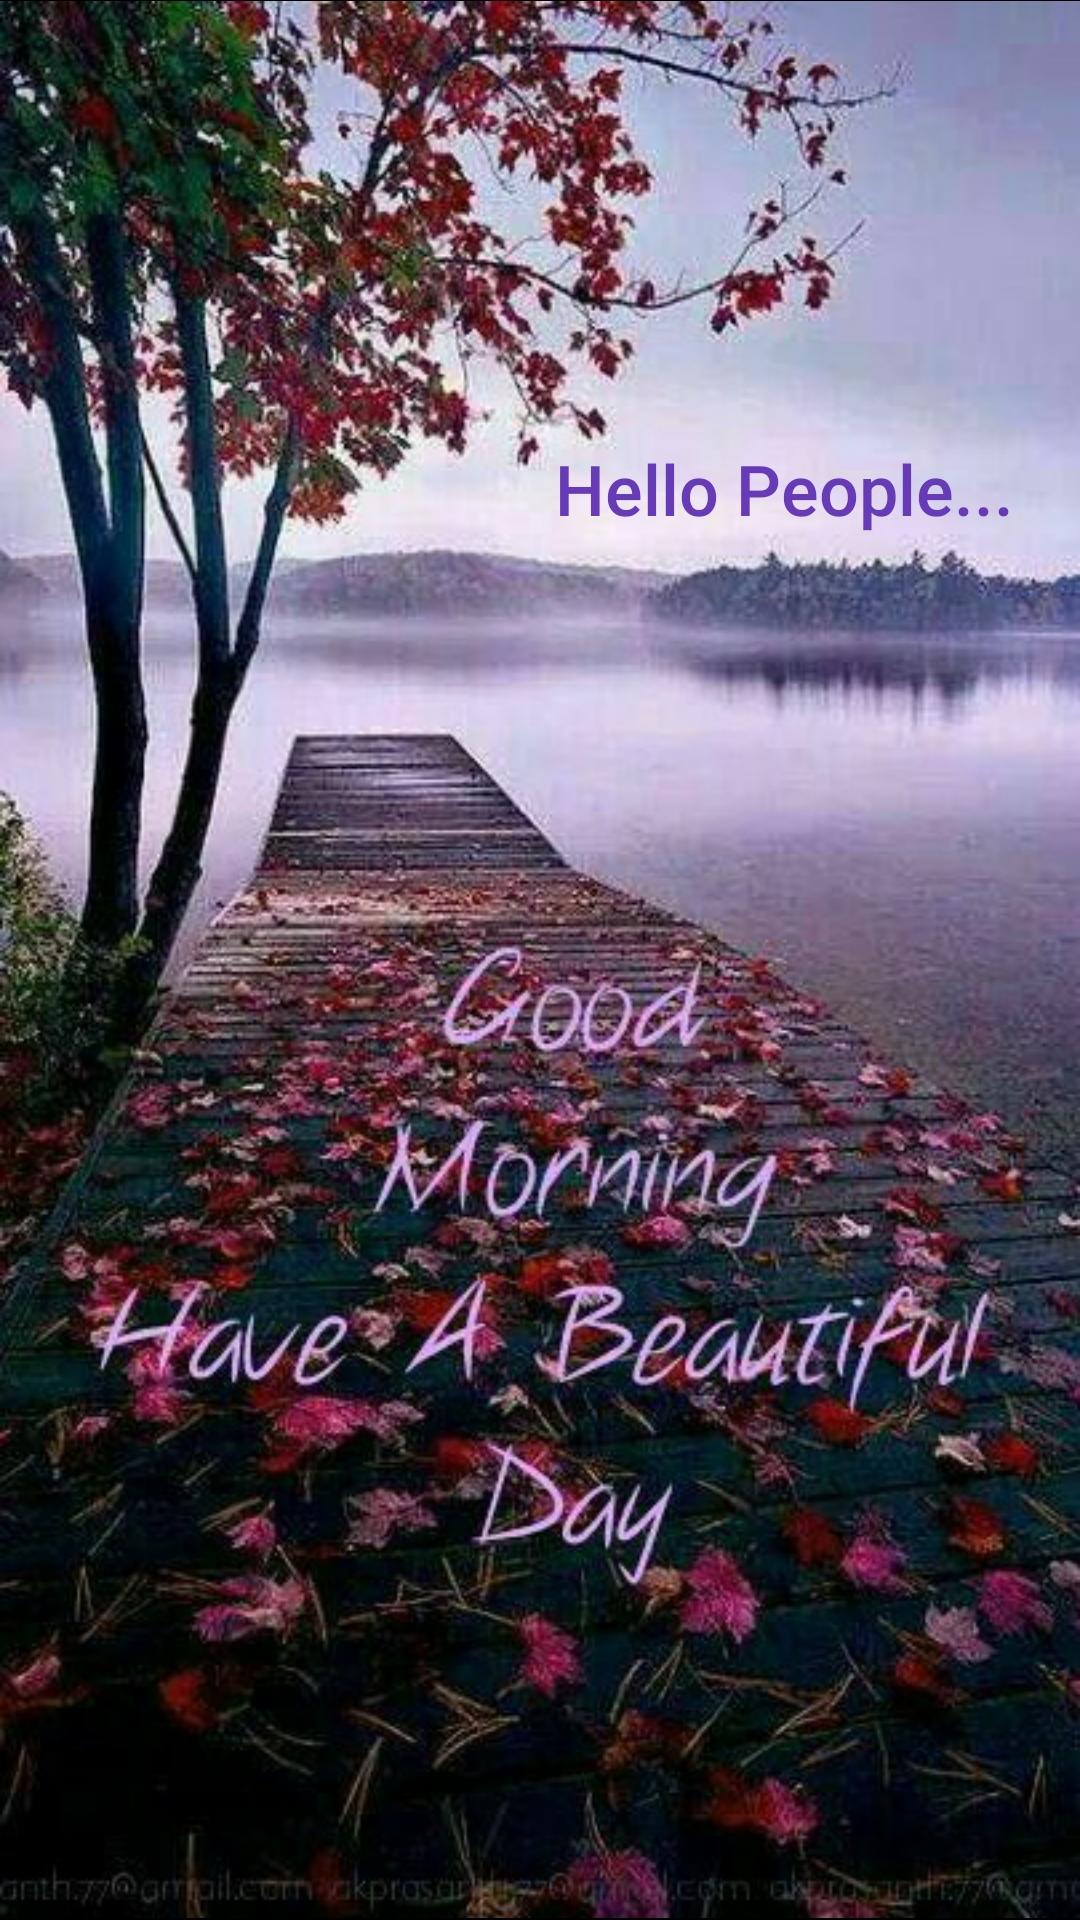 Hello People...